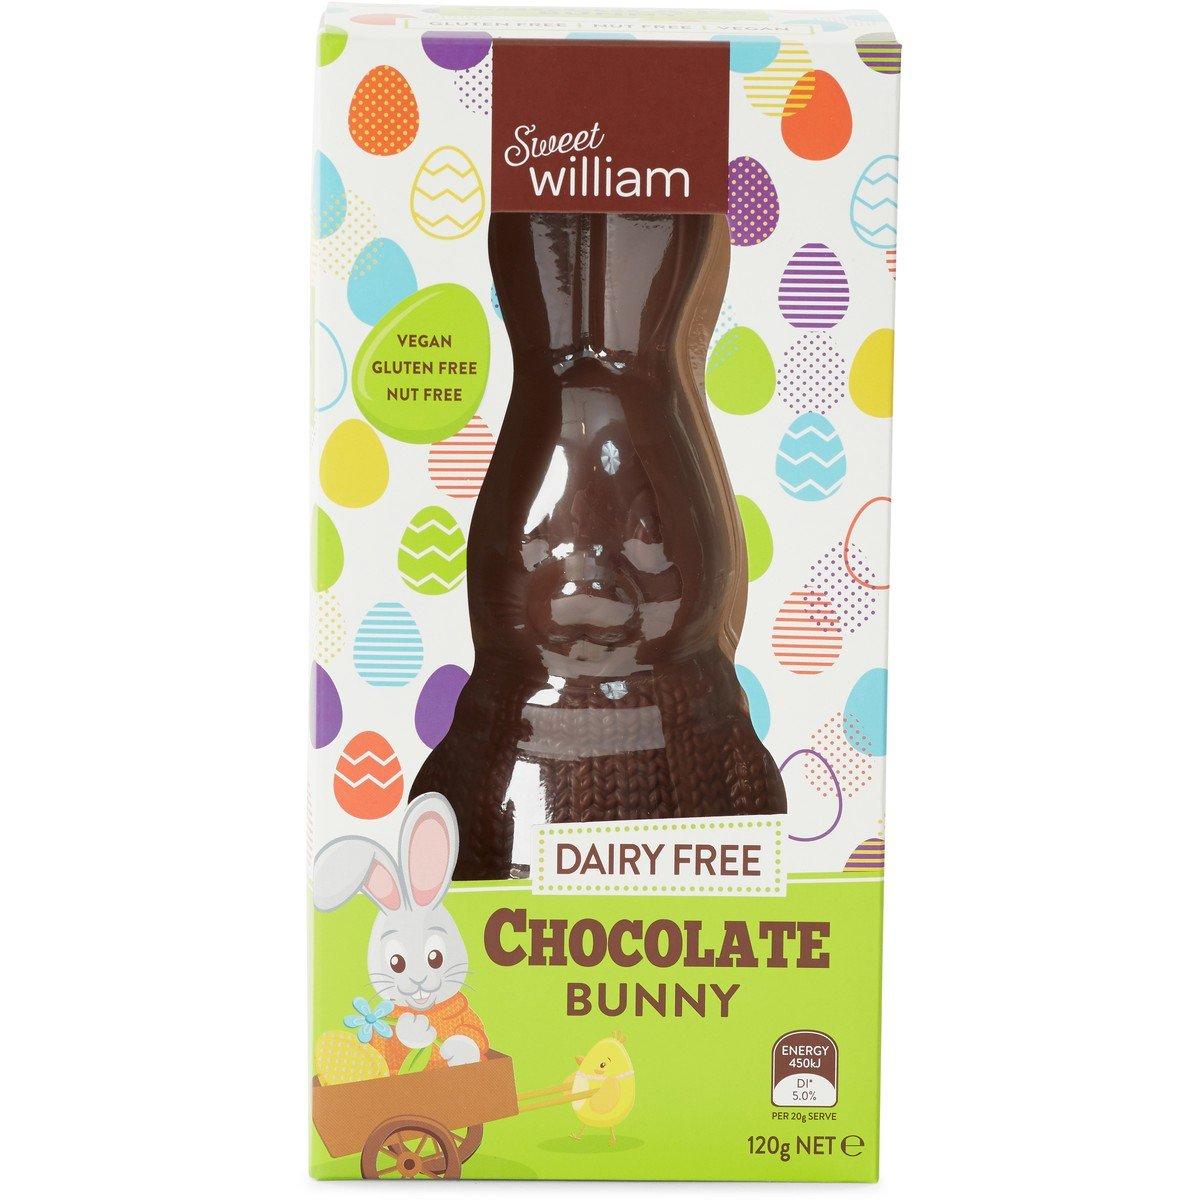 Image of Sweet William Dairy Free Chocolate Bunny